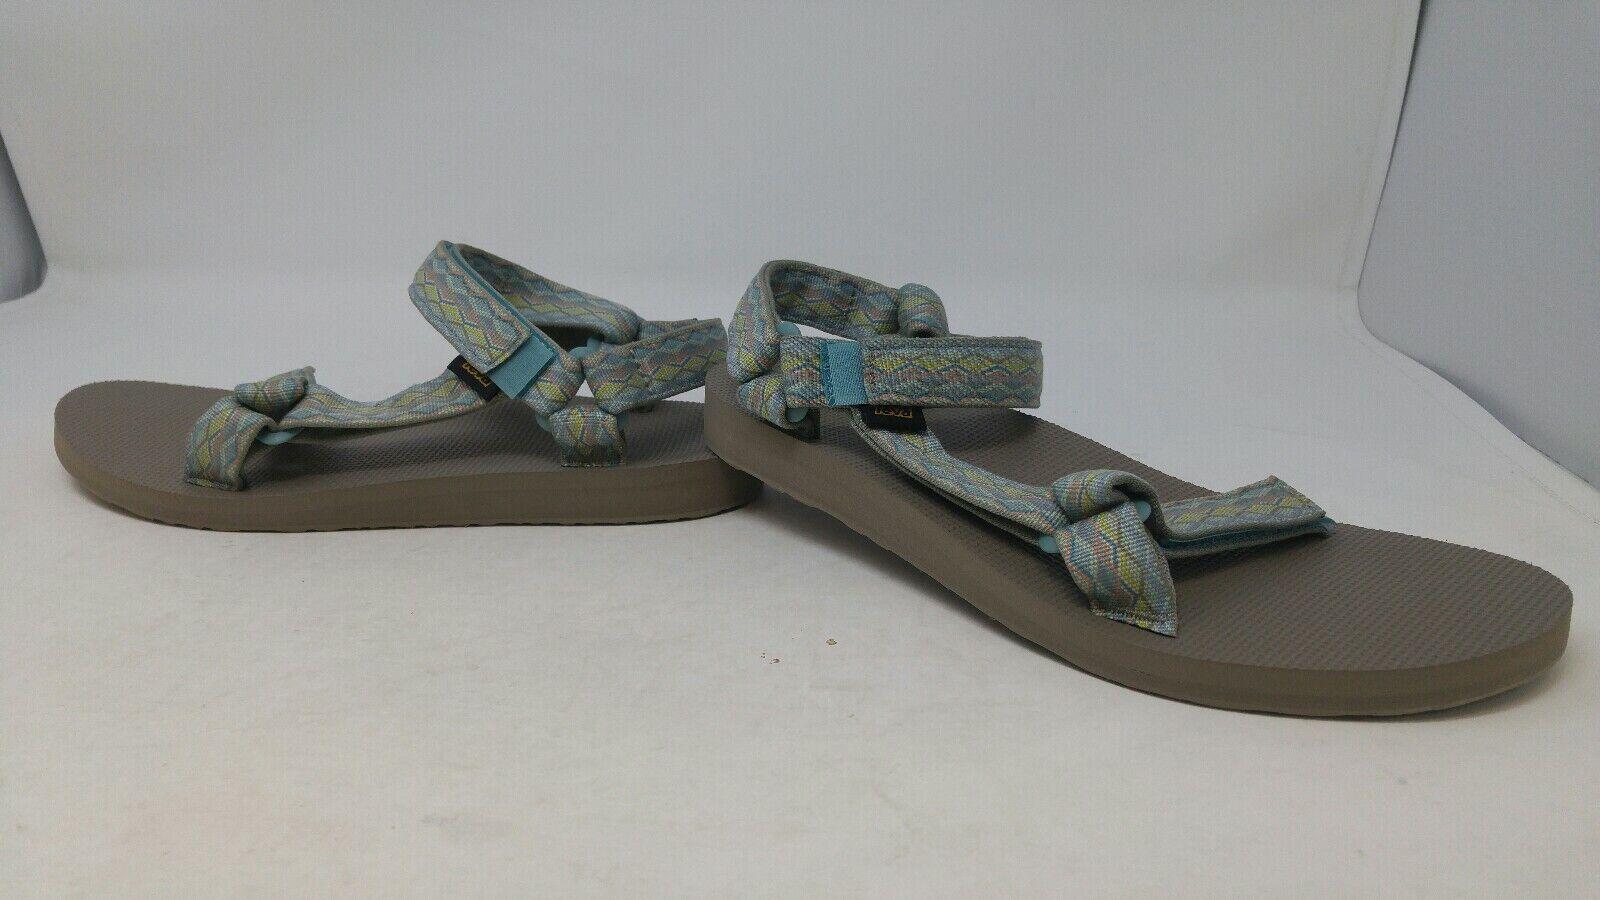 Teva Original Universal Femme SANDALE Talon Bas chaussures Talon Bas Taille 10